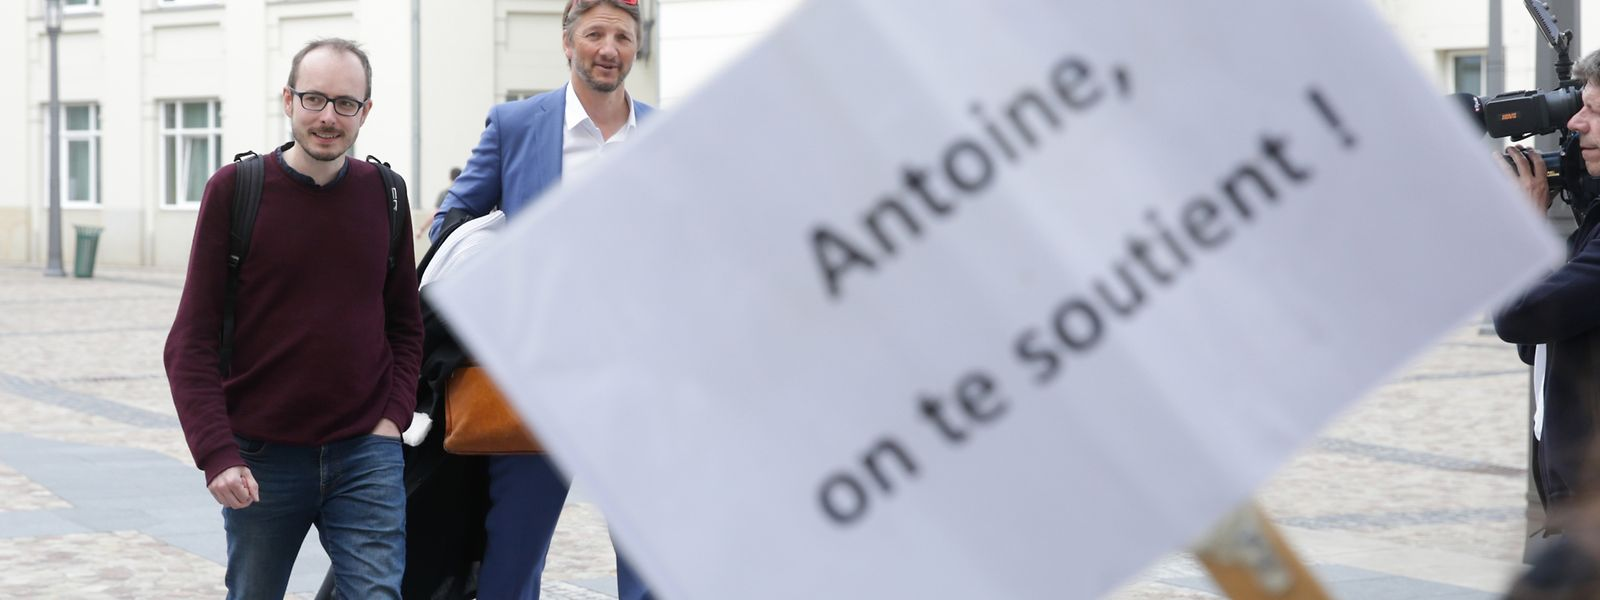 Antoine Deltour e o advogado Philippe Penning.